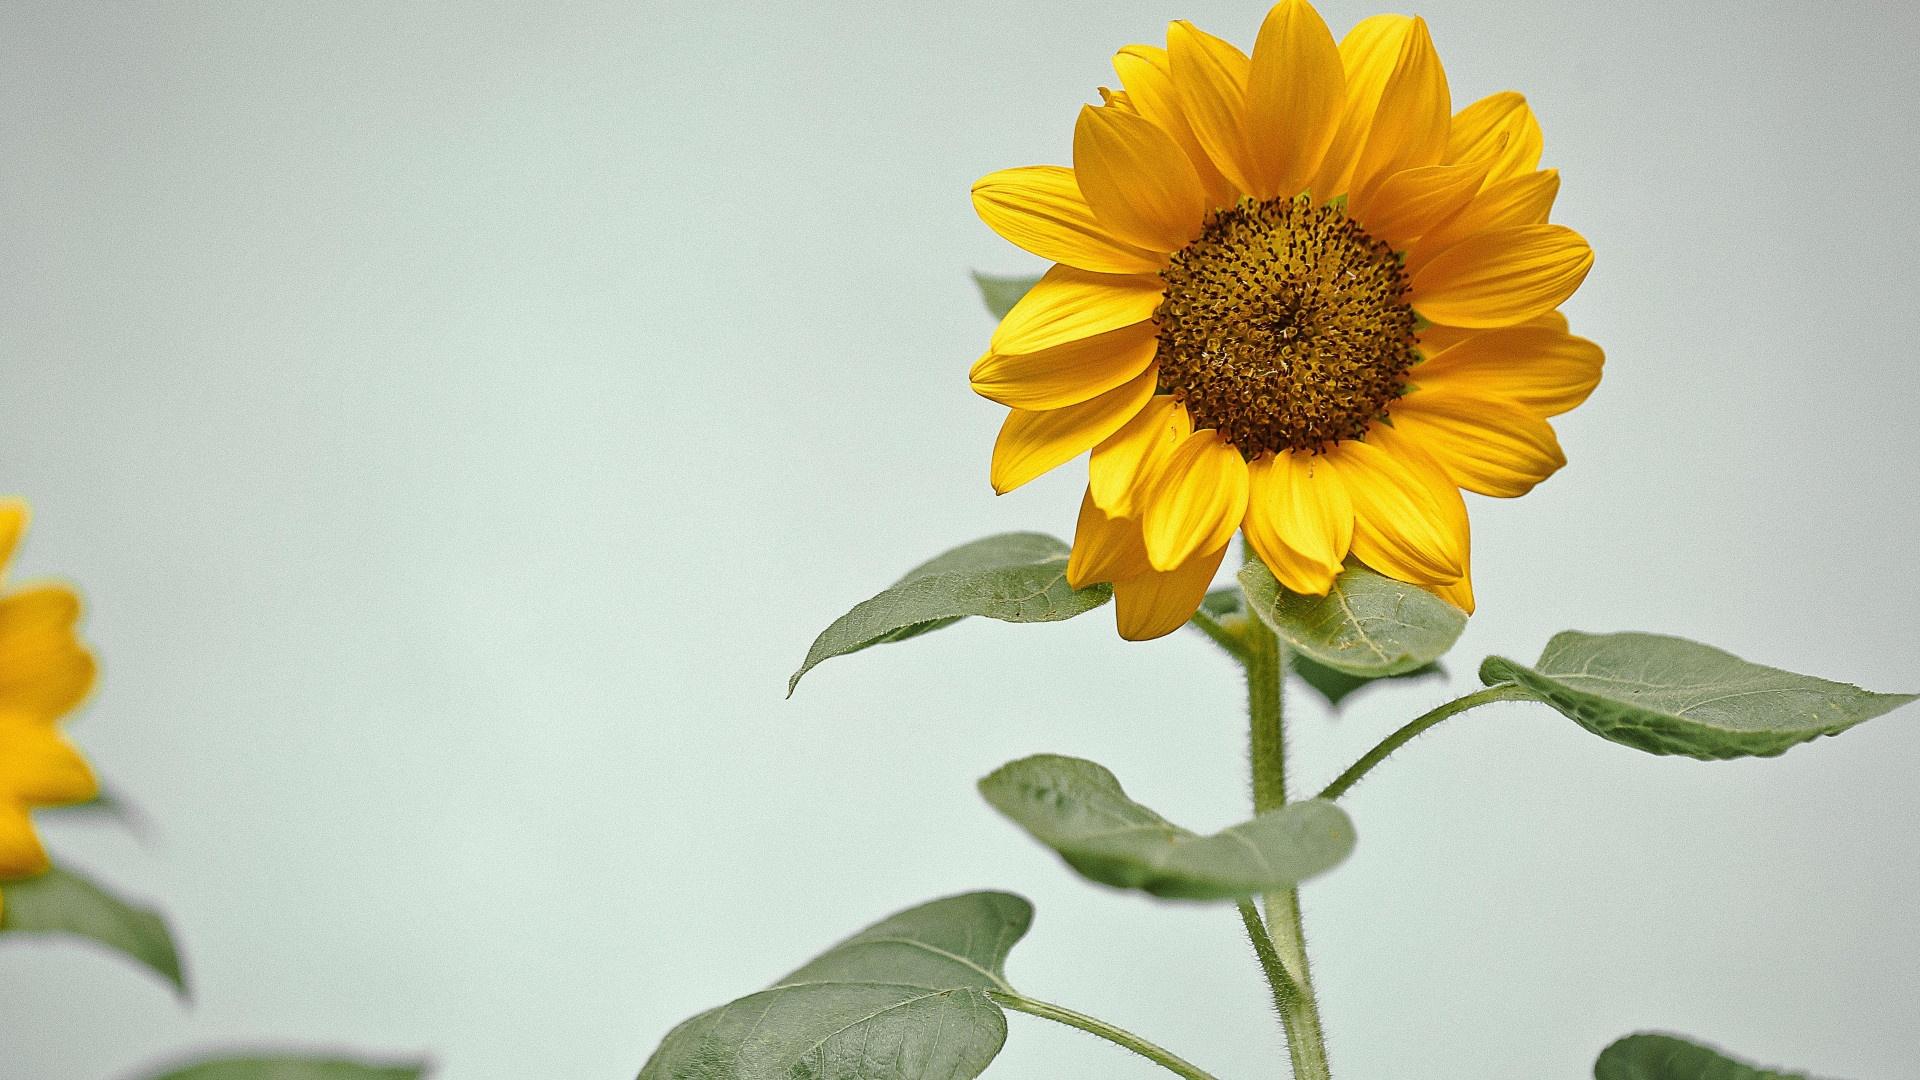 Sunflower free image